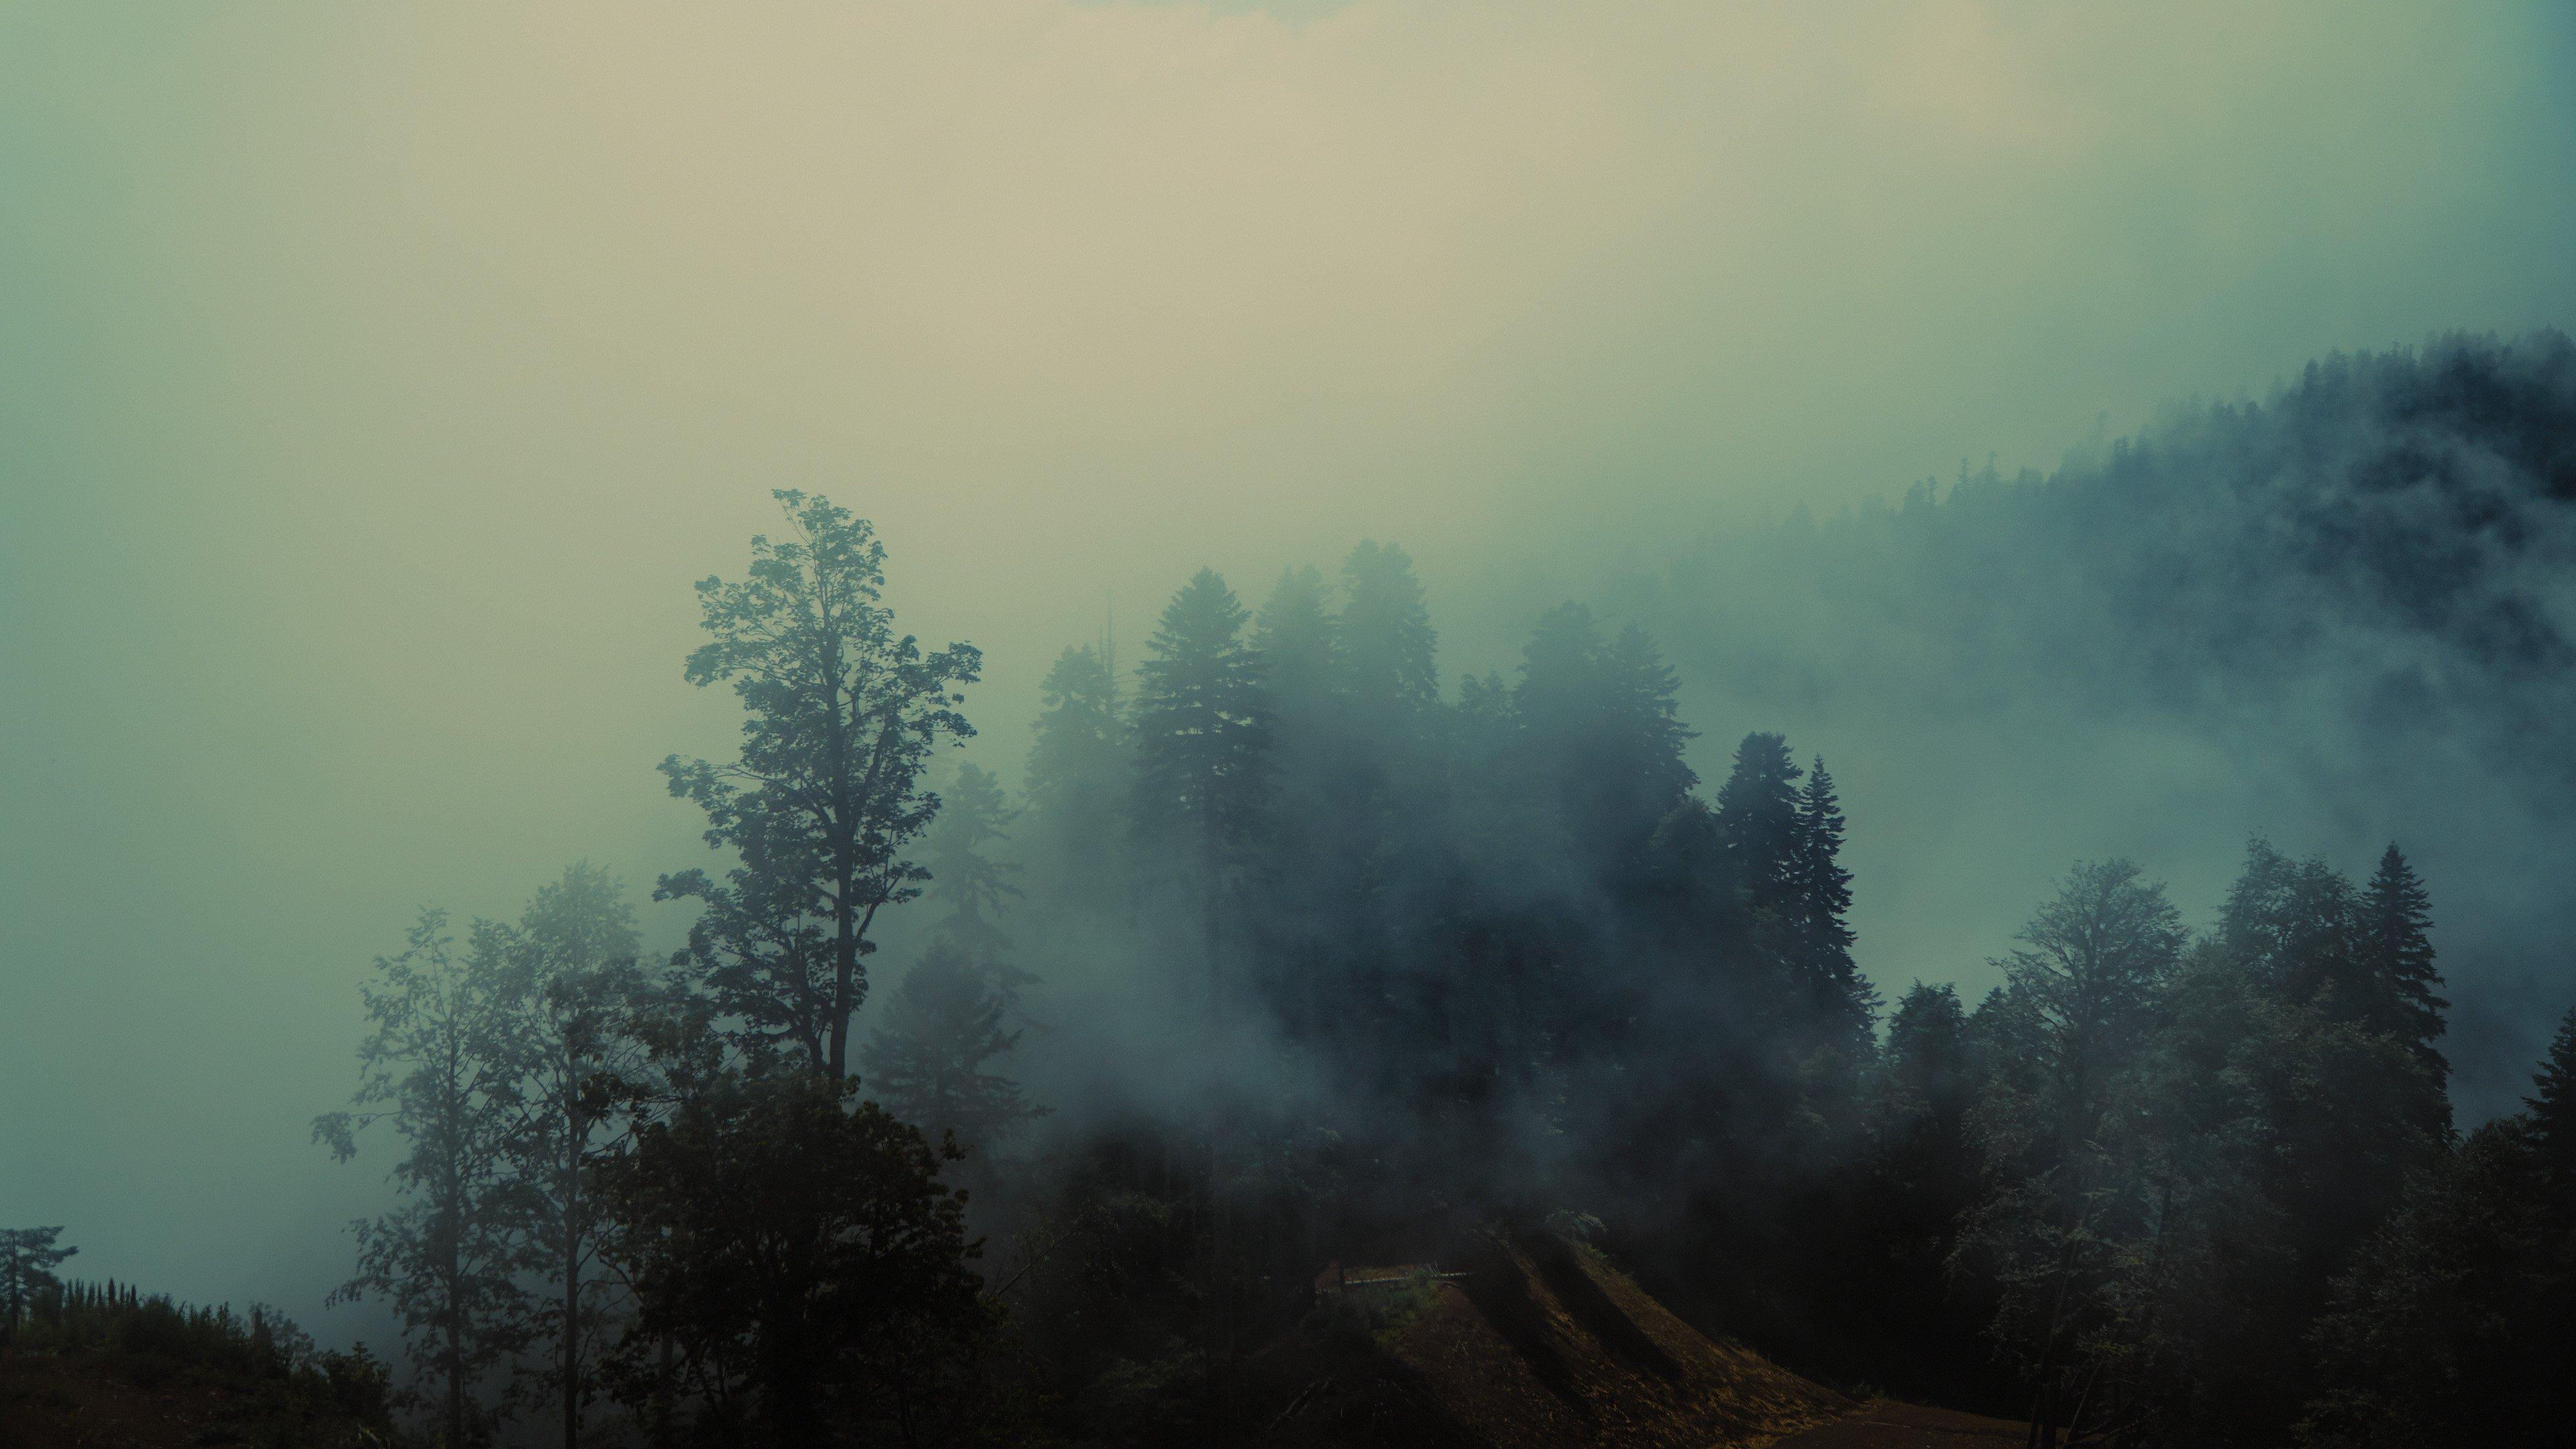 fog, volume, light, forest, tress, myst, shadows, landscape, colors, colorgrade, colorgrading, film, cine, cinematic, sochi, rosa khutor, Кыштымов Максим